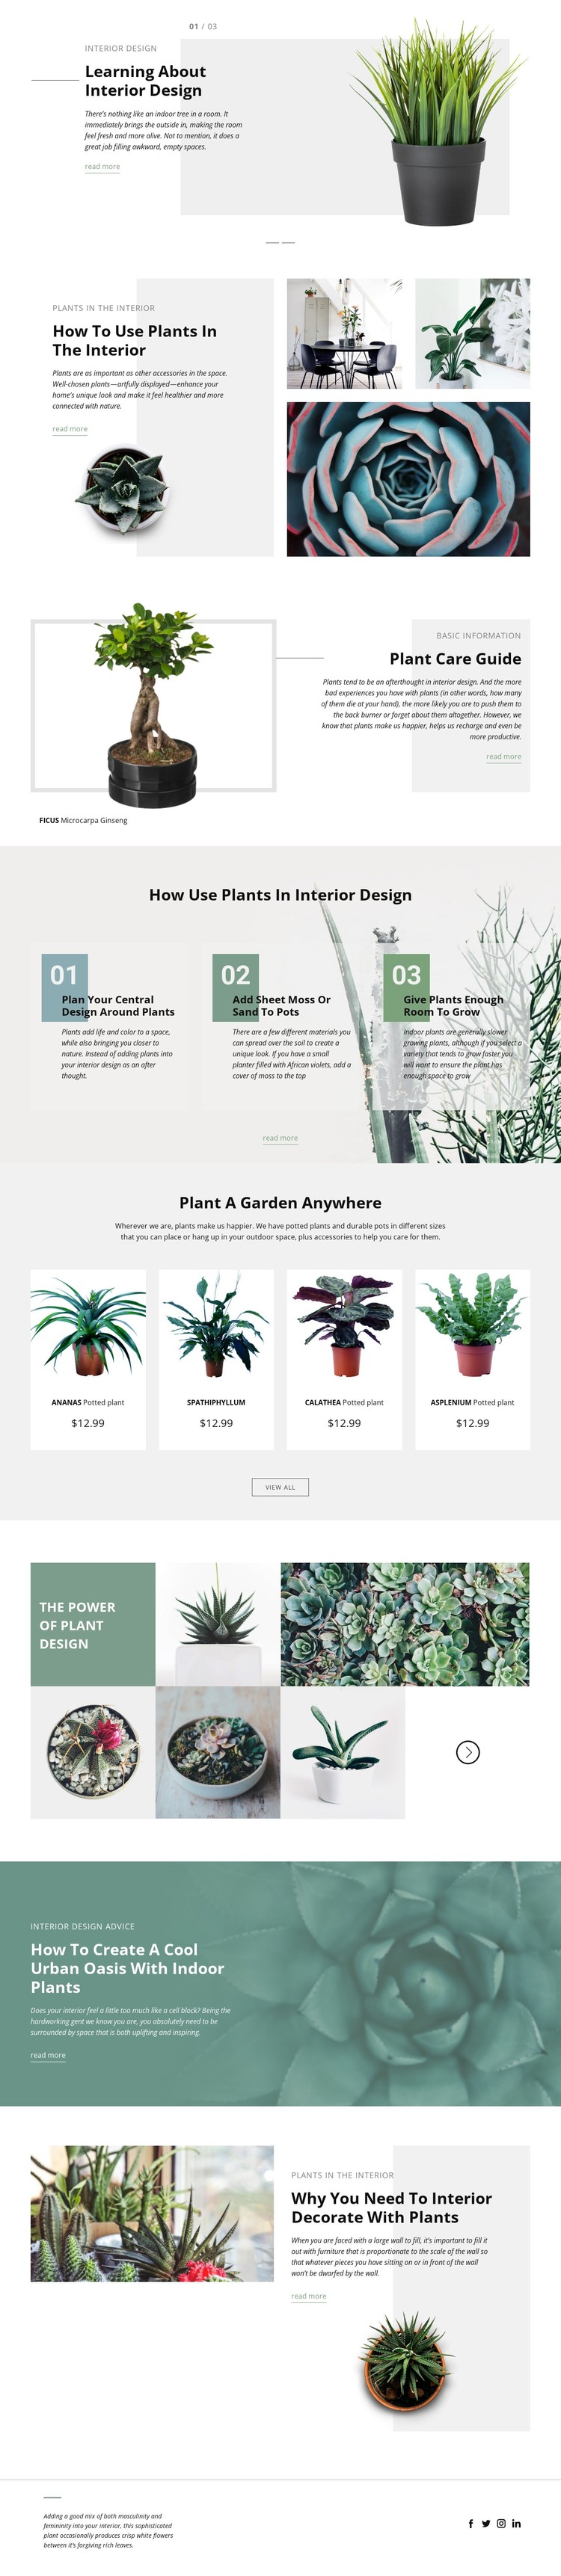 Interior Design Studio WordPress Template